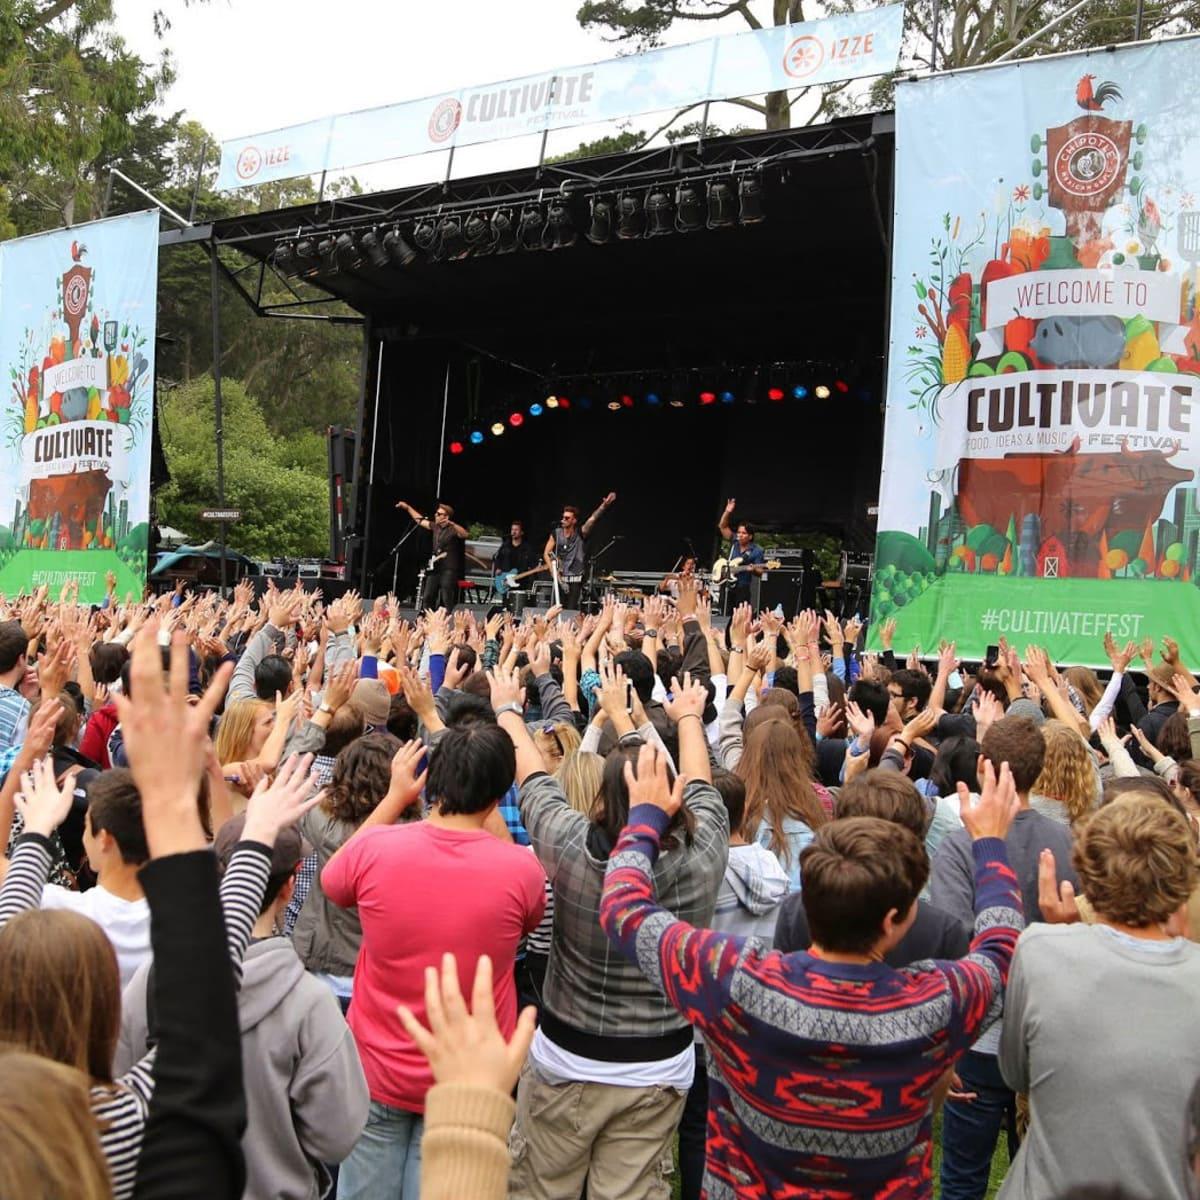 Cultivate Food, Ideas & Music Festival